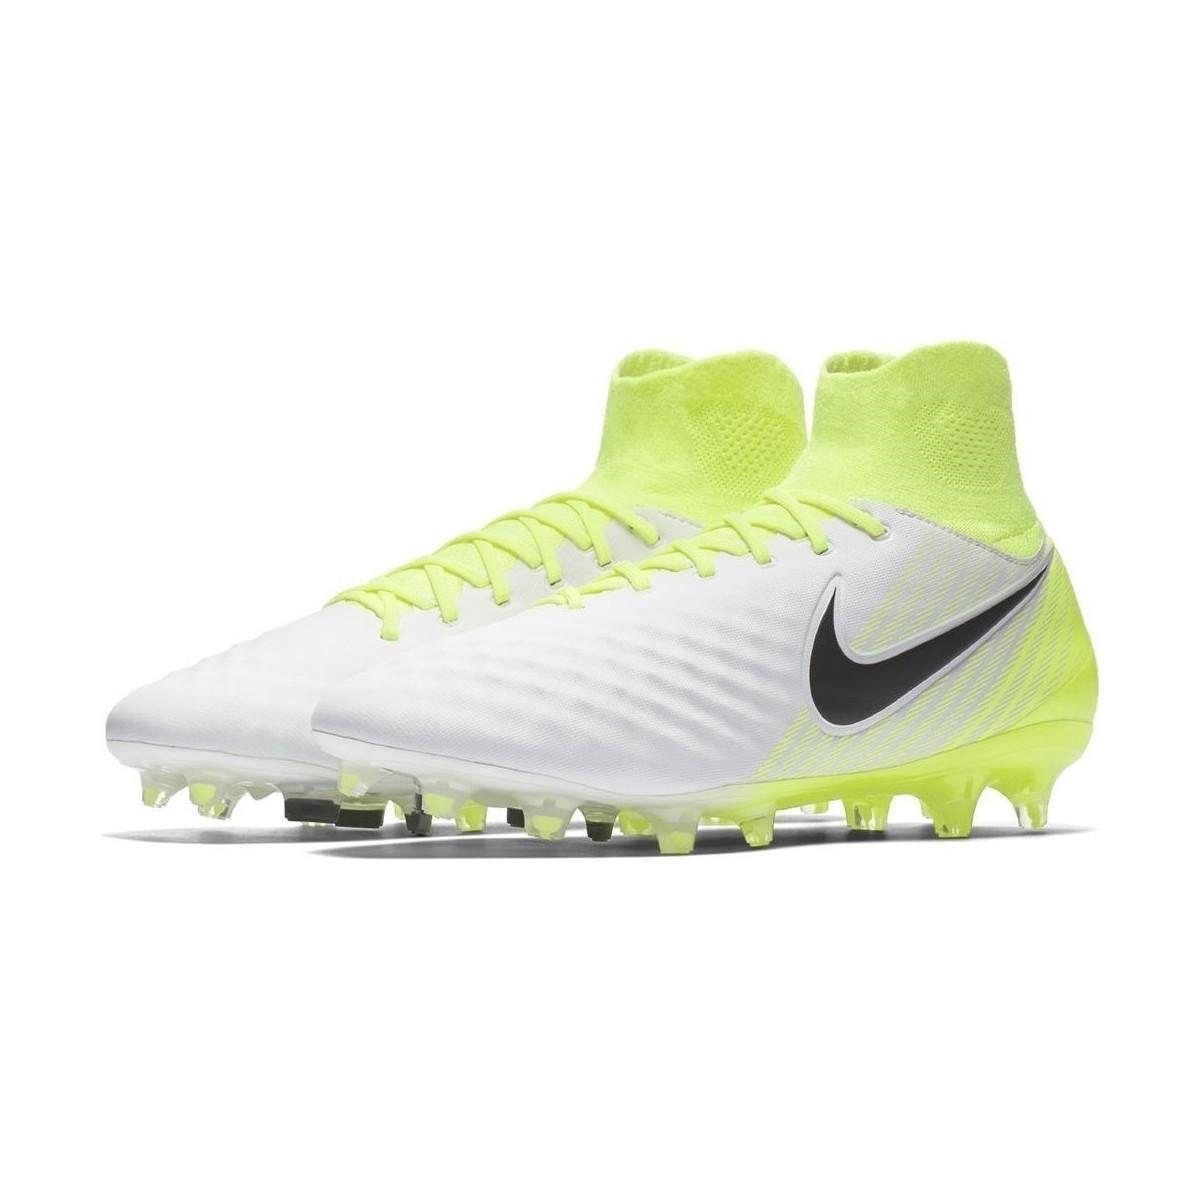 cb51149a19ee Lyst - Nike Magista Orden Ii Fg Men's Football Boots In Multicolour ...